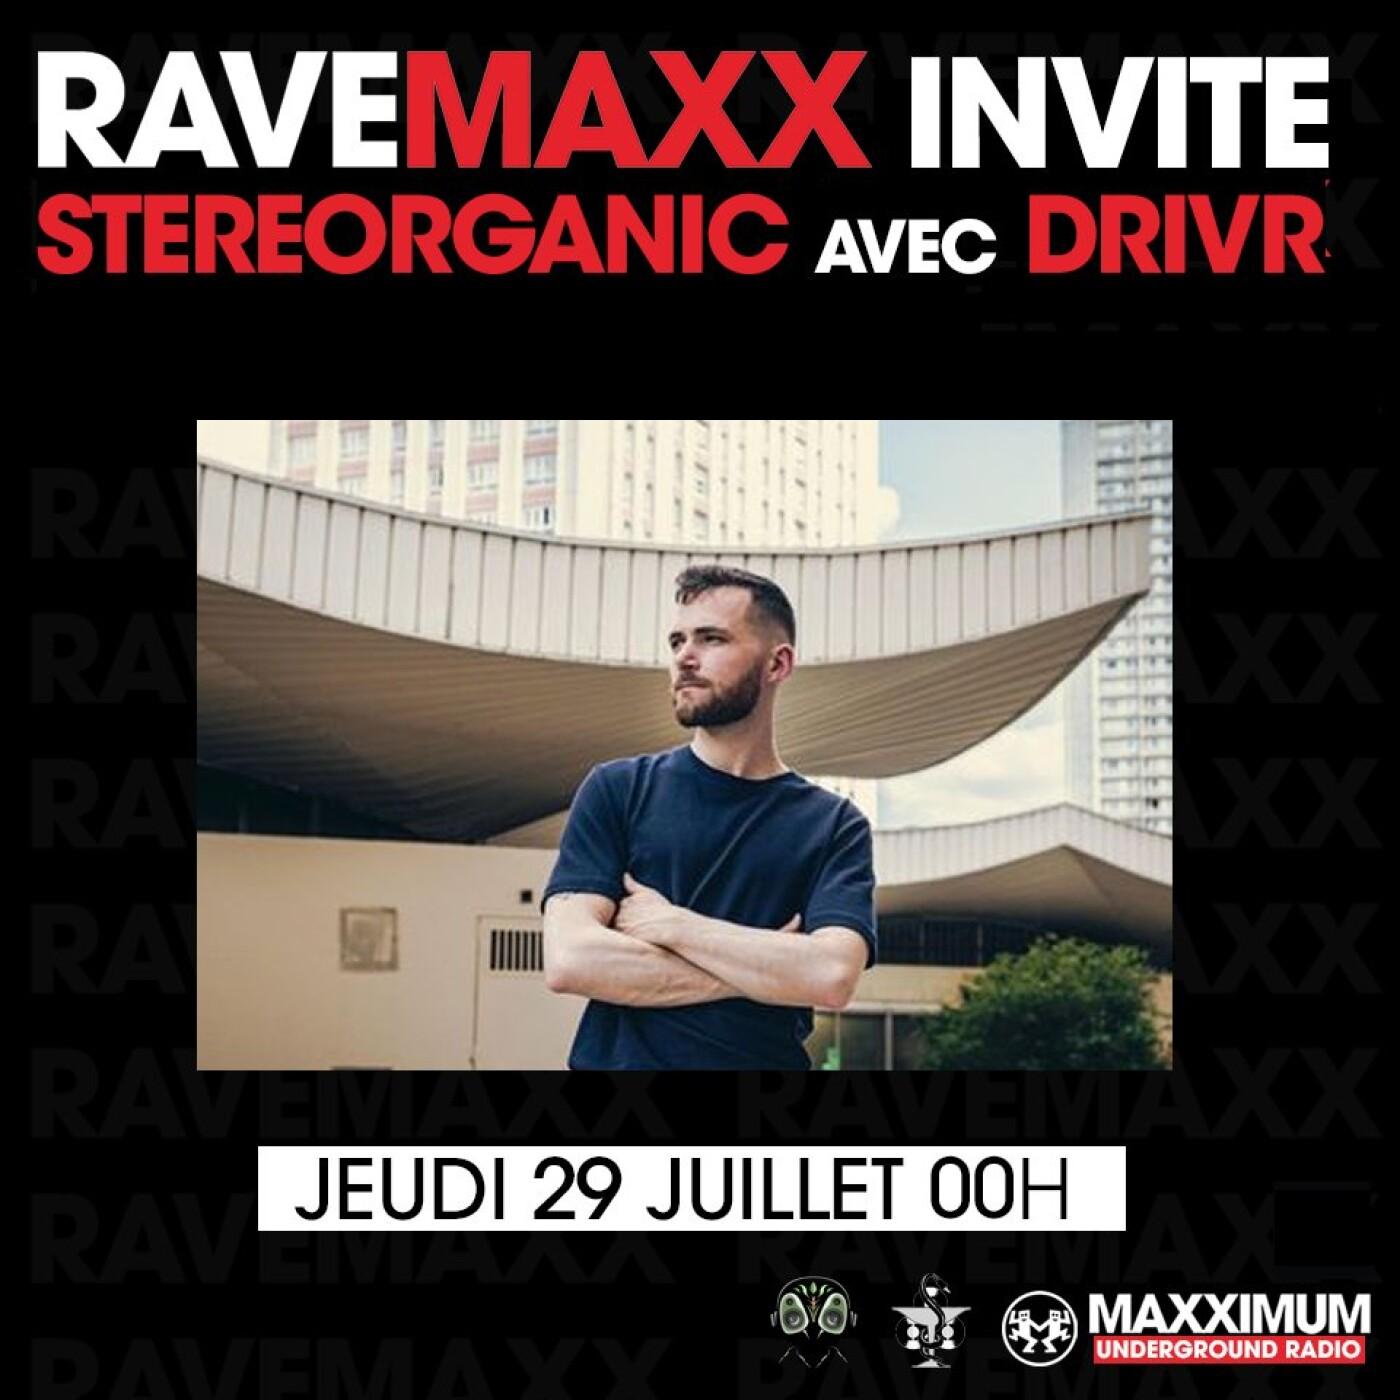 RAVEMAXX : DRIVR